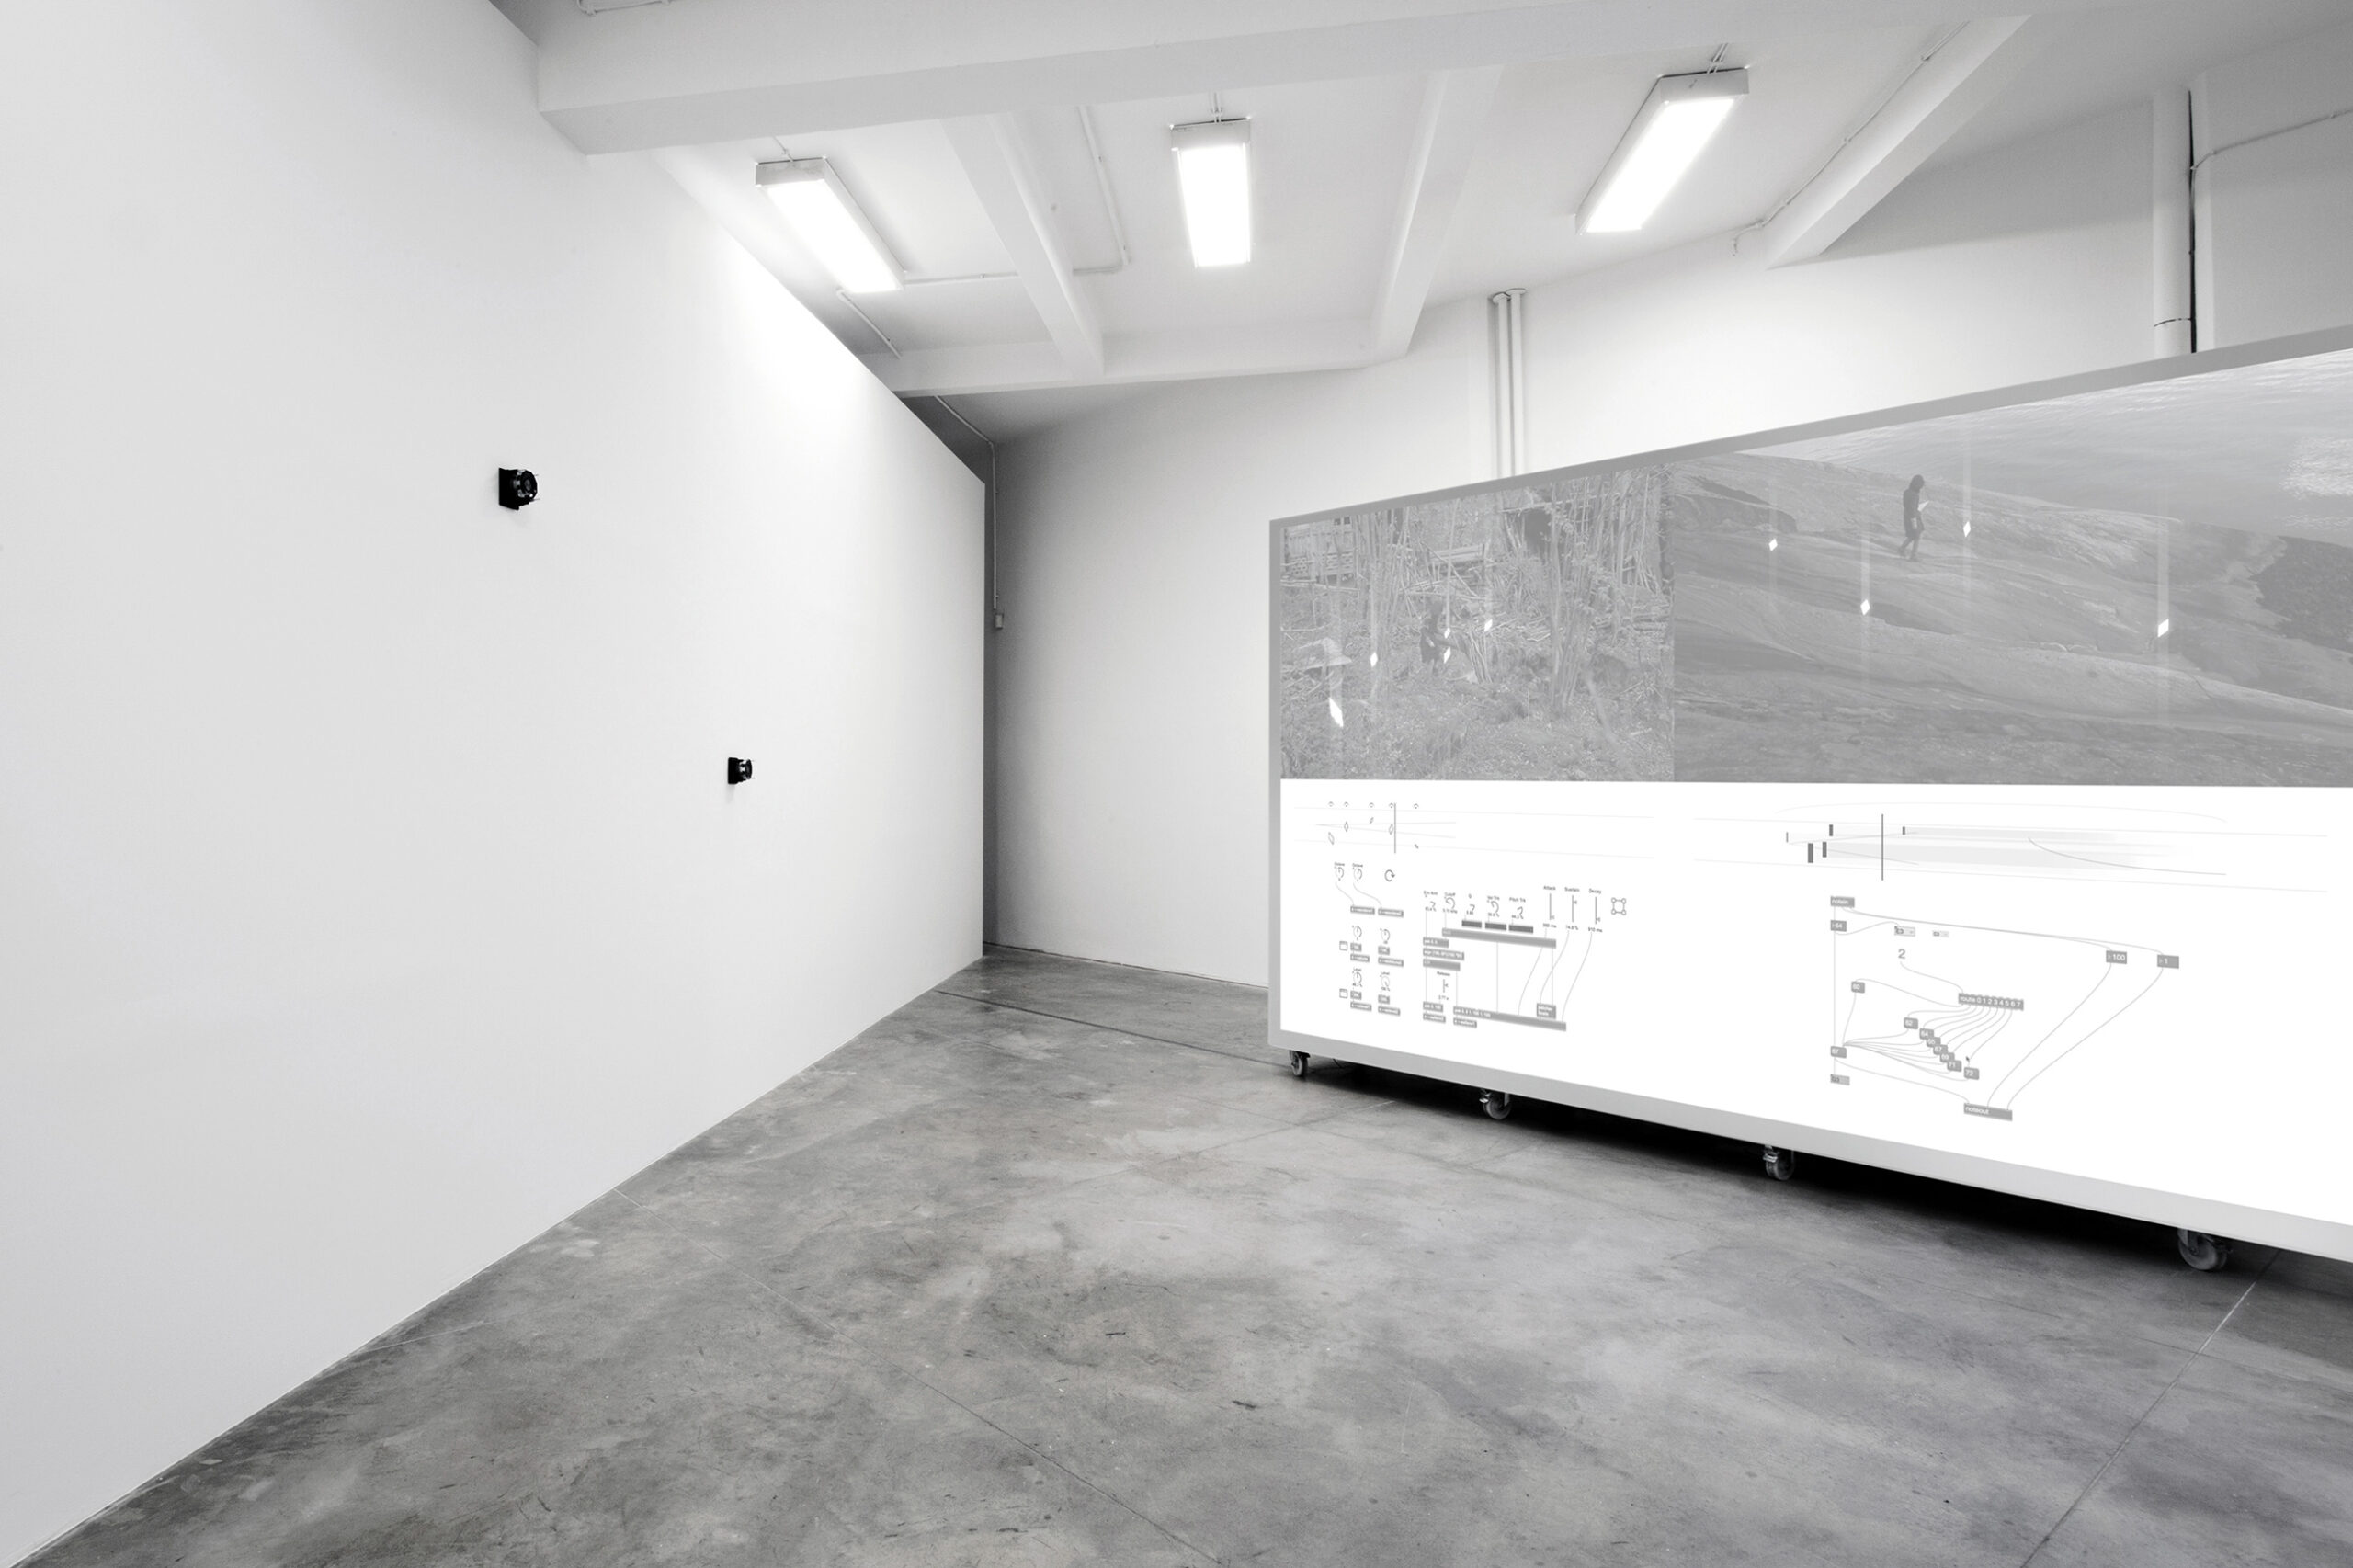 Jacek Doroszenko - Polyphonic Body, exhibition view, FAIT Gallery, Brno